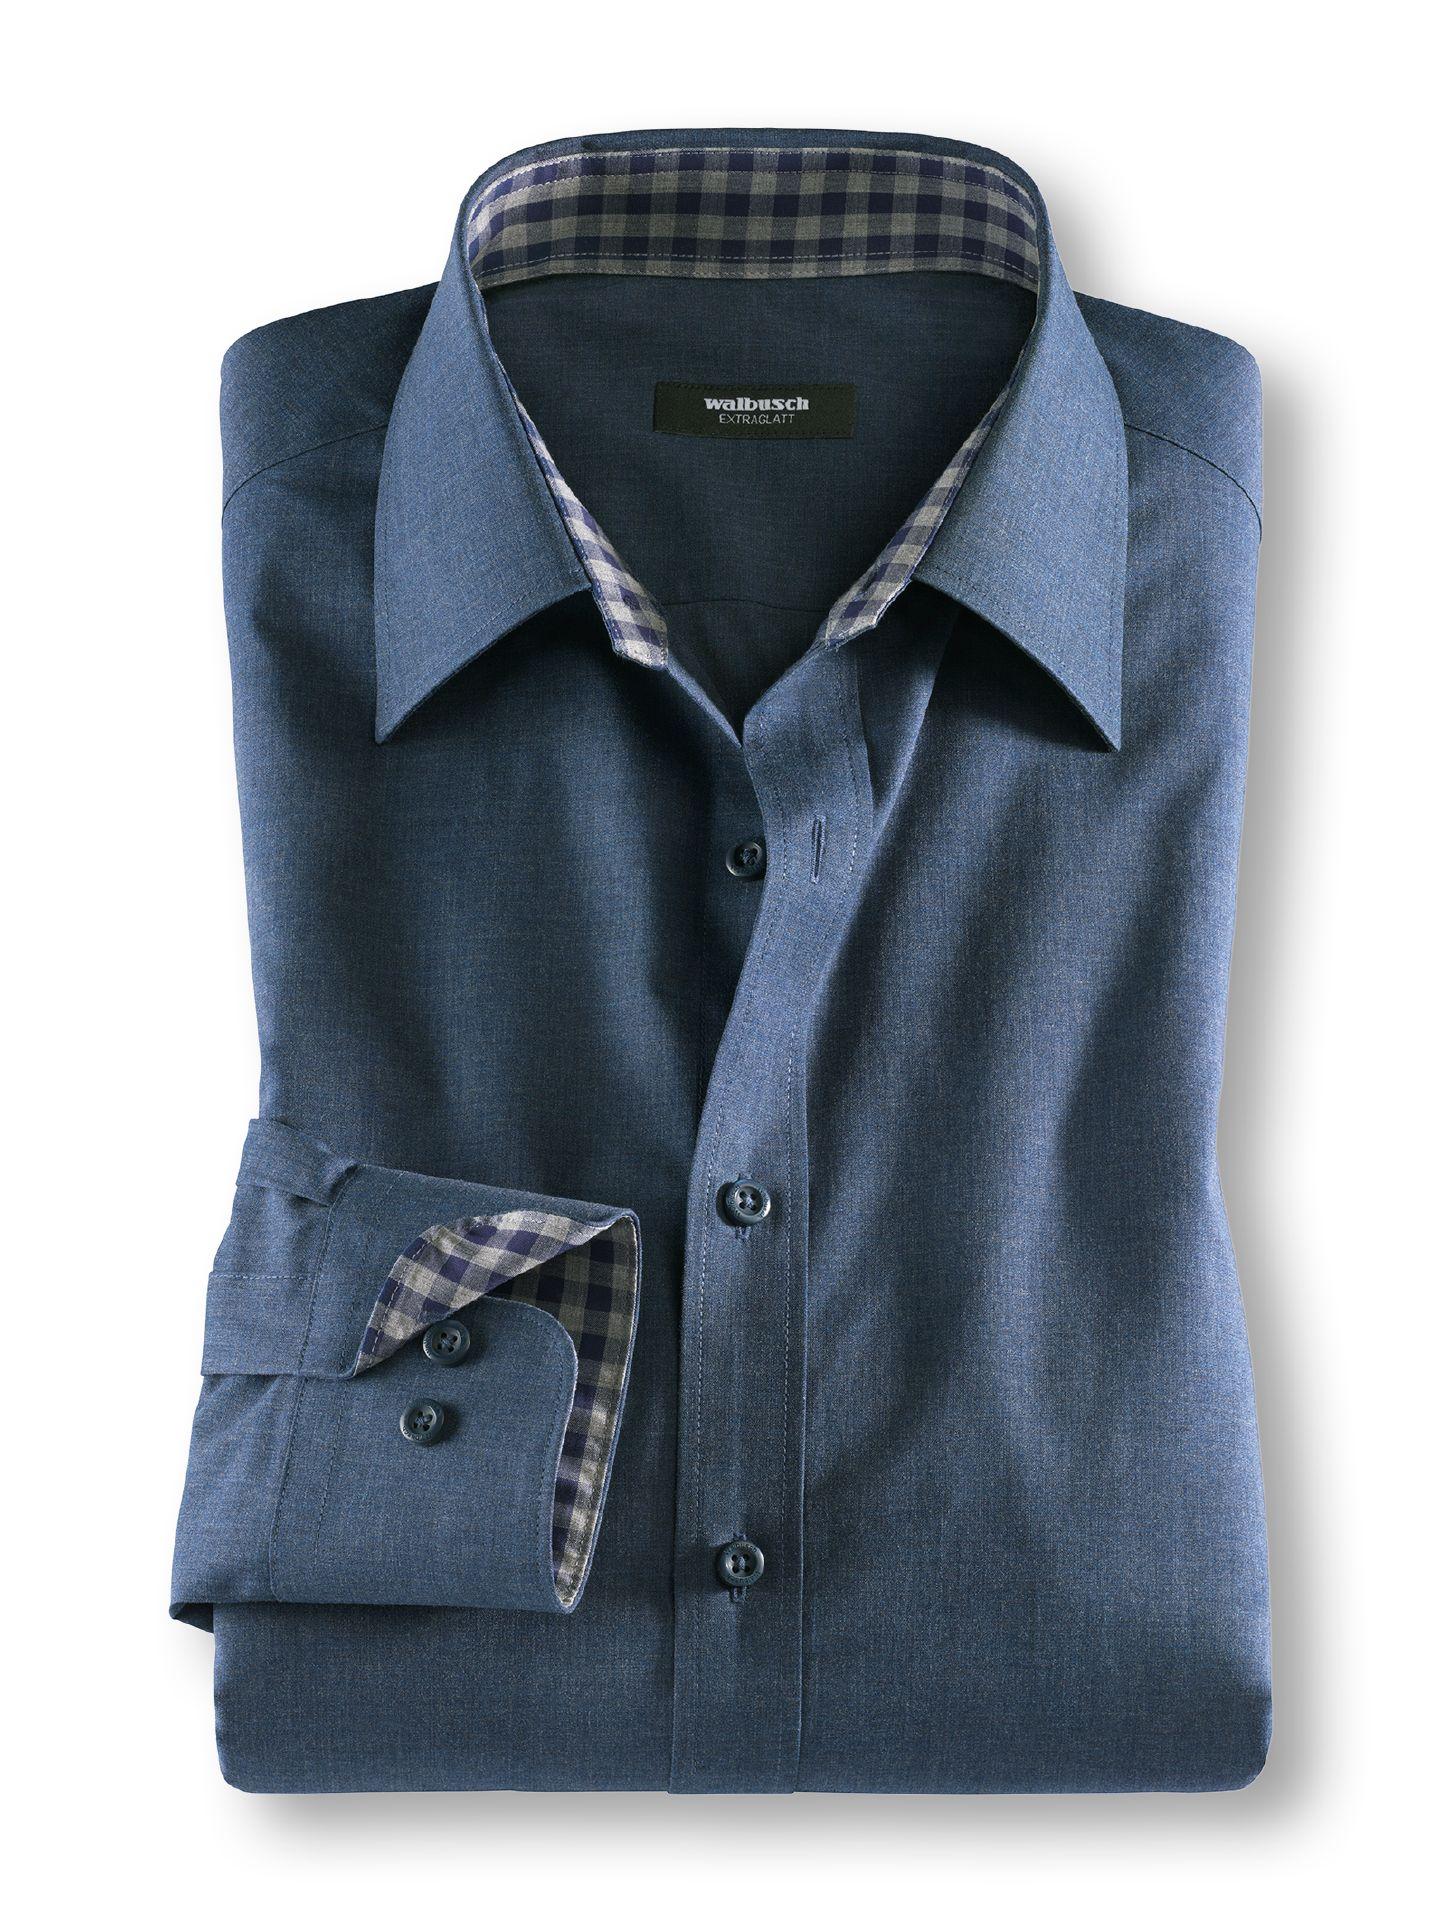 aktiv hemd 2 0 slim fit im online shop bequem kaufen walbusch. Black Bedroom Furniture Sets. Home Design Ideas